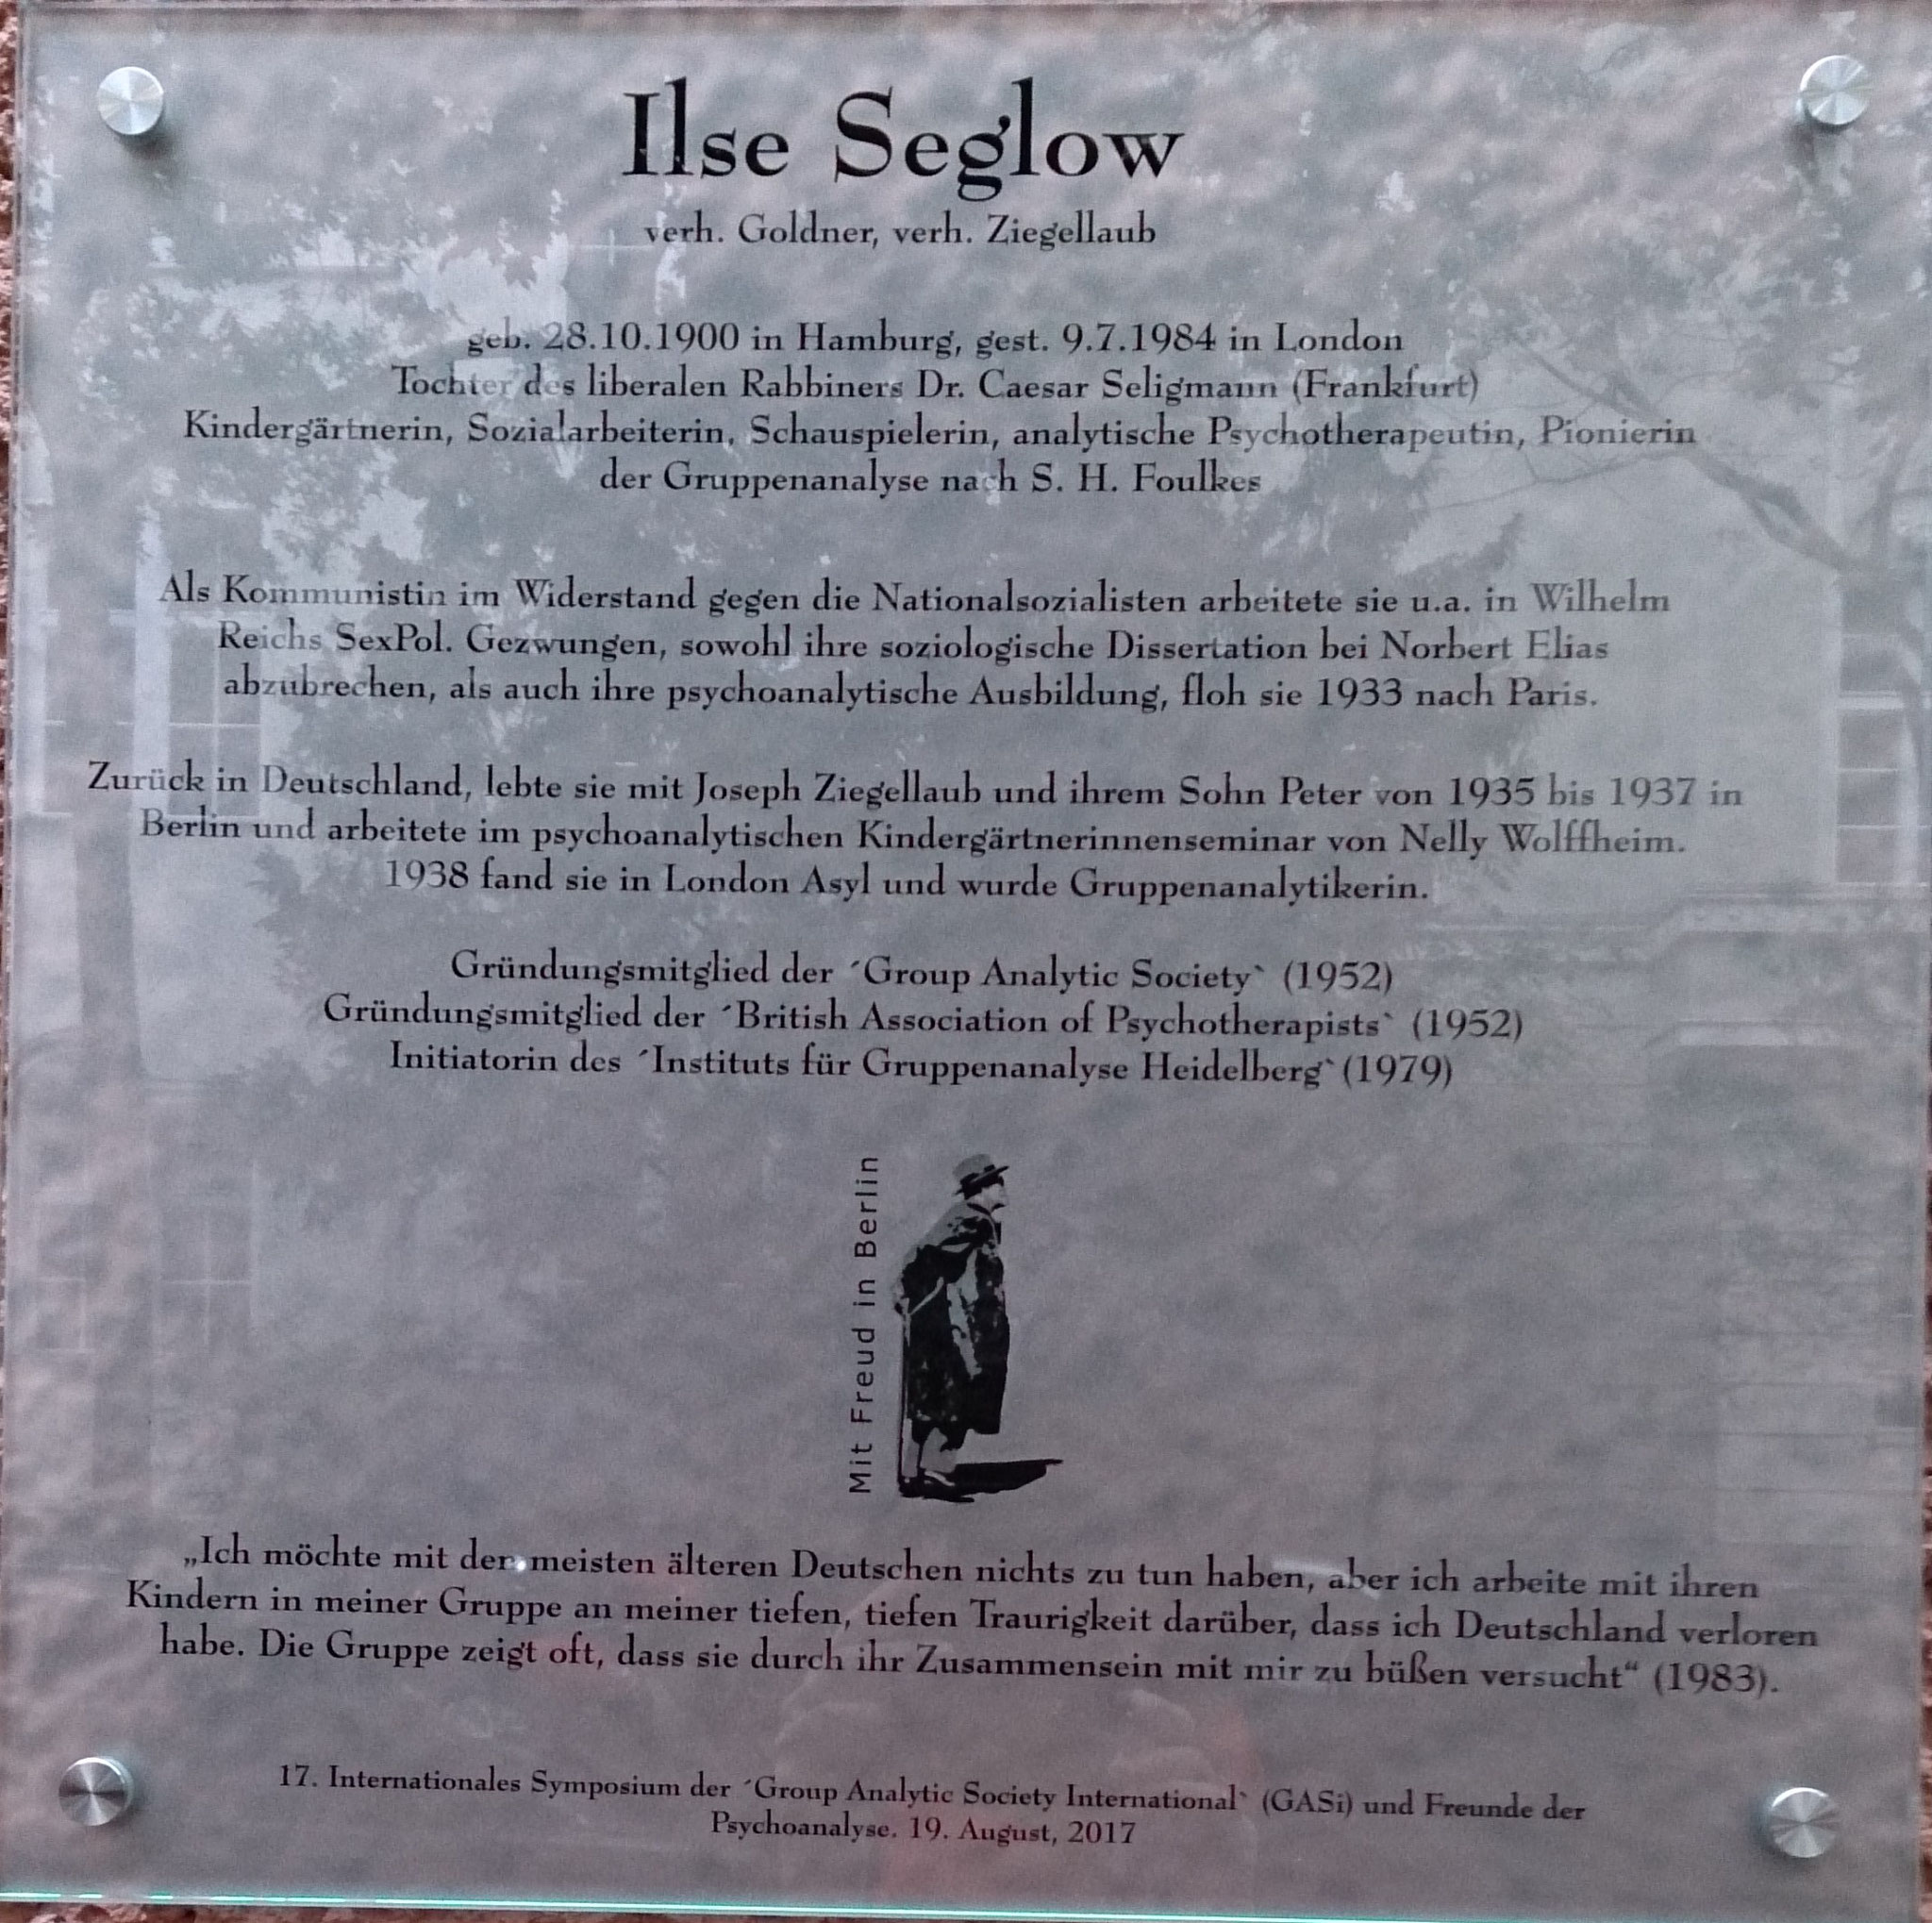 Ilse Seglow